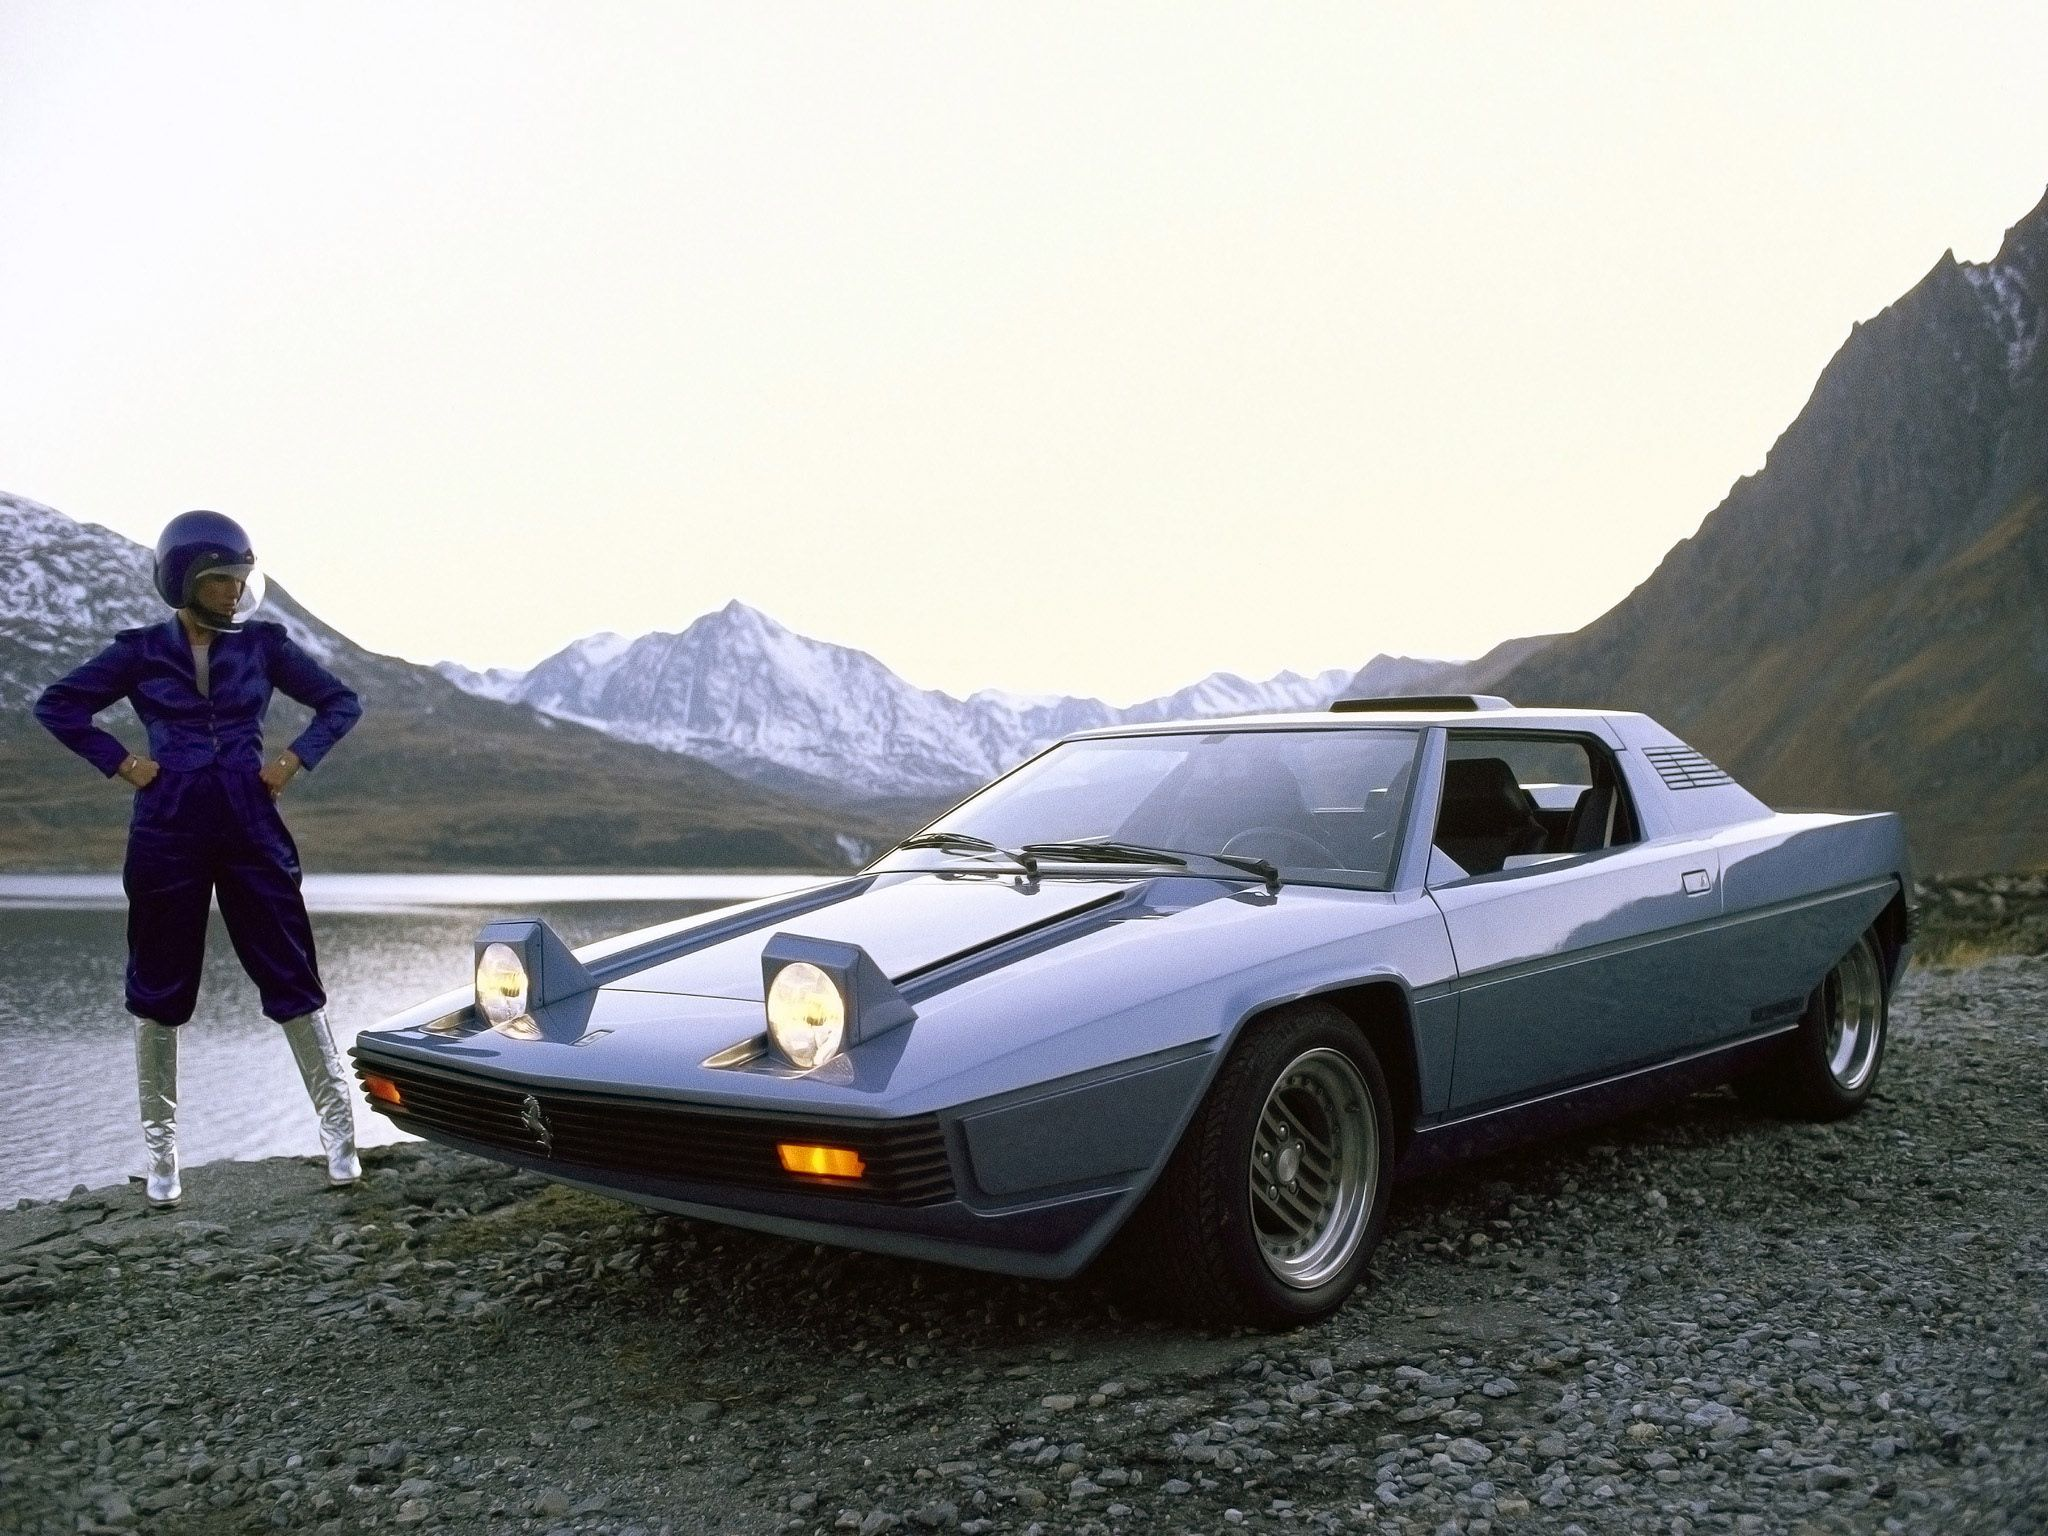 ddf12c2ad6286d5b63ccc156b4ae1567 Terrific Ferrari Mondial Cabrio In Vendita Cars Trend